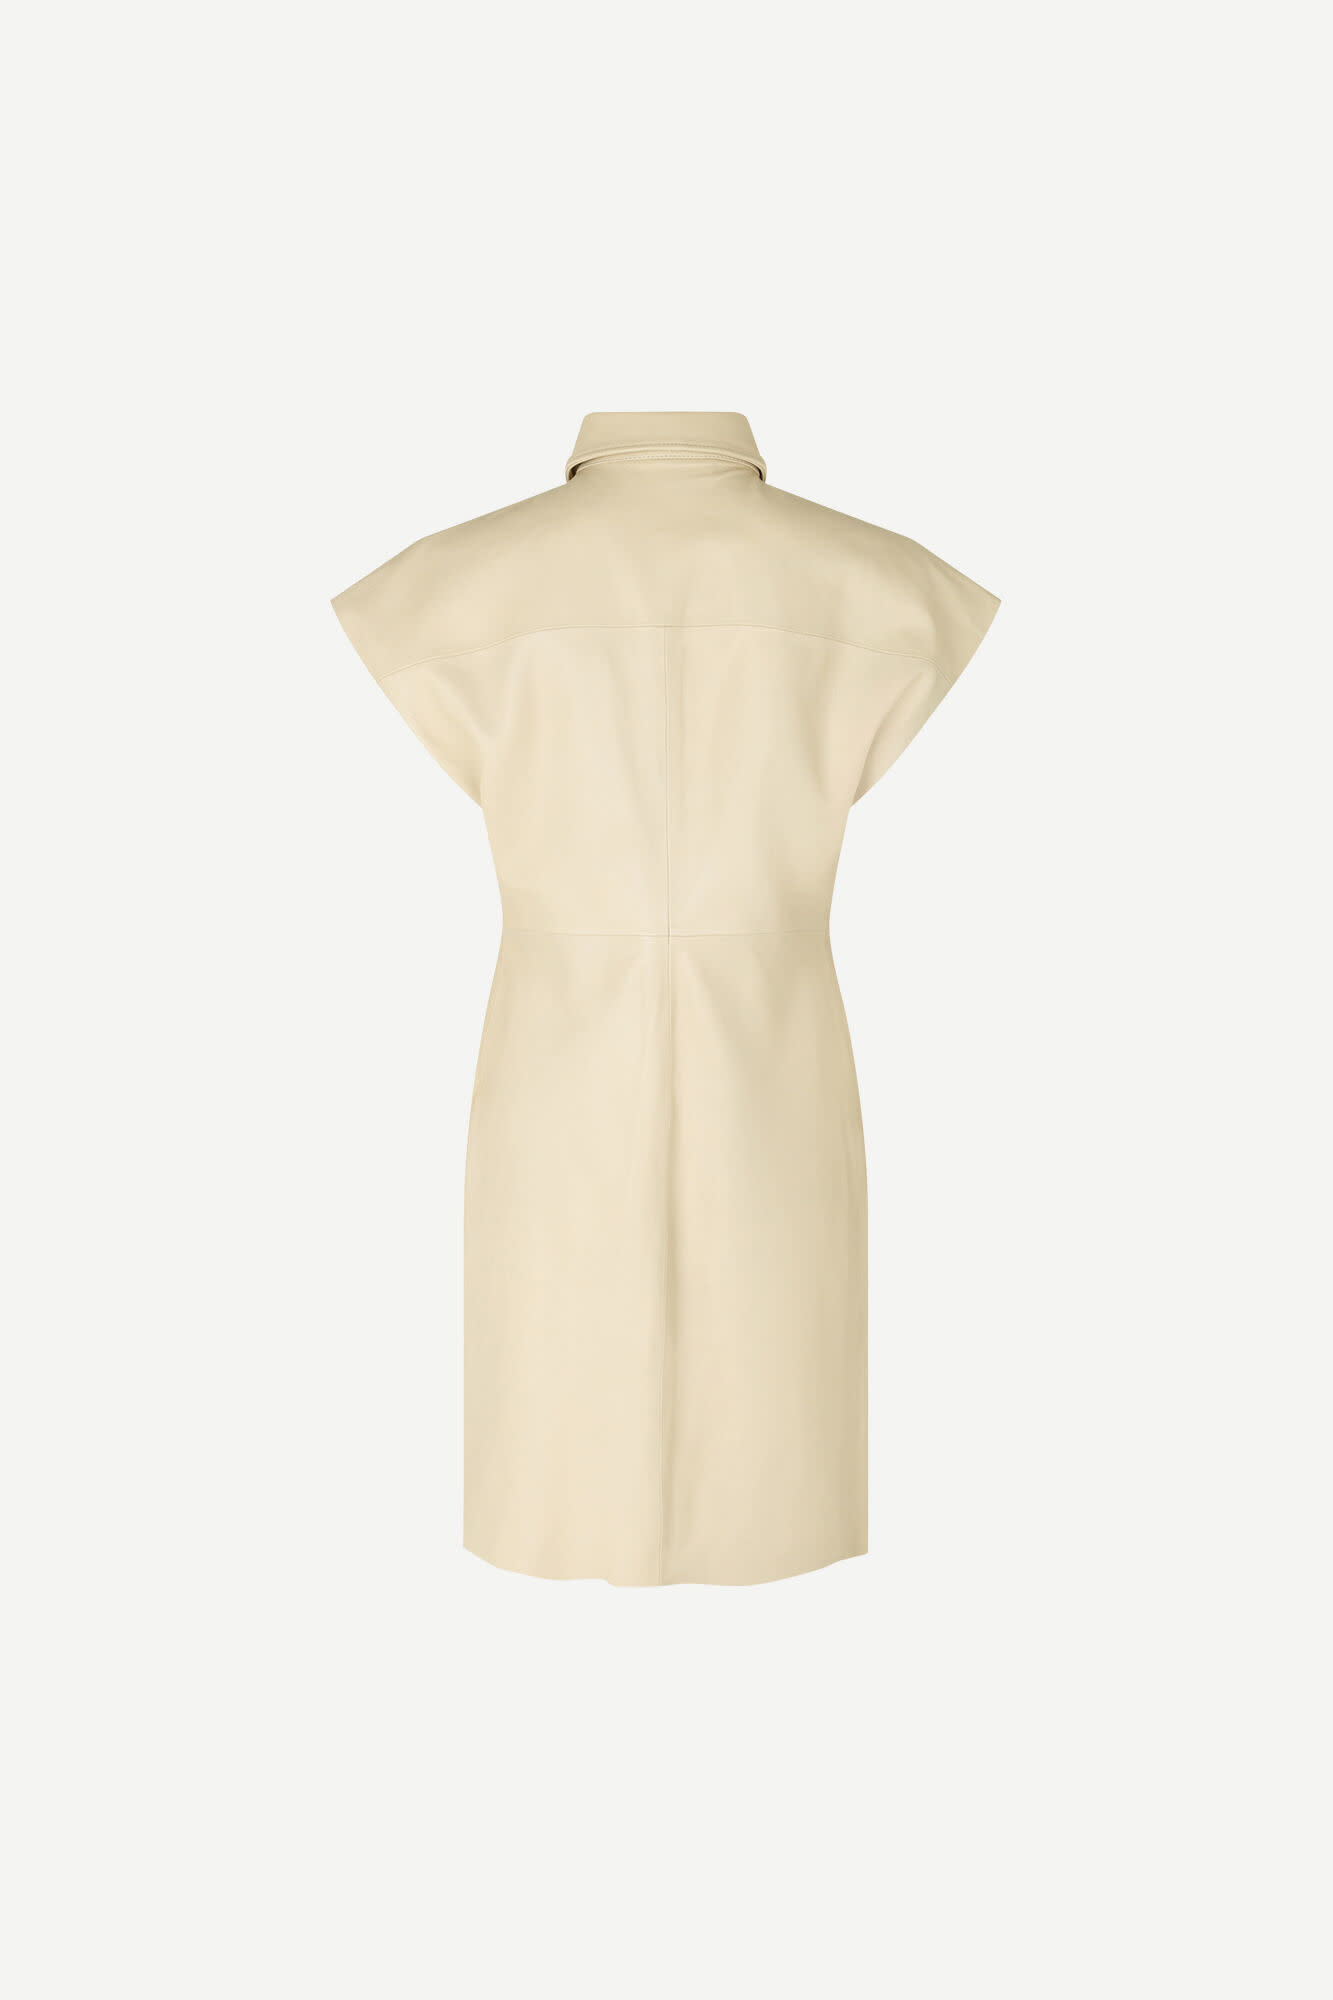 Ariah Rice Brown Leather Dress-1